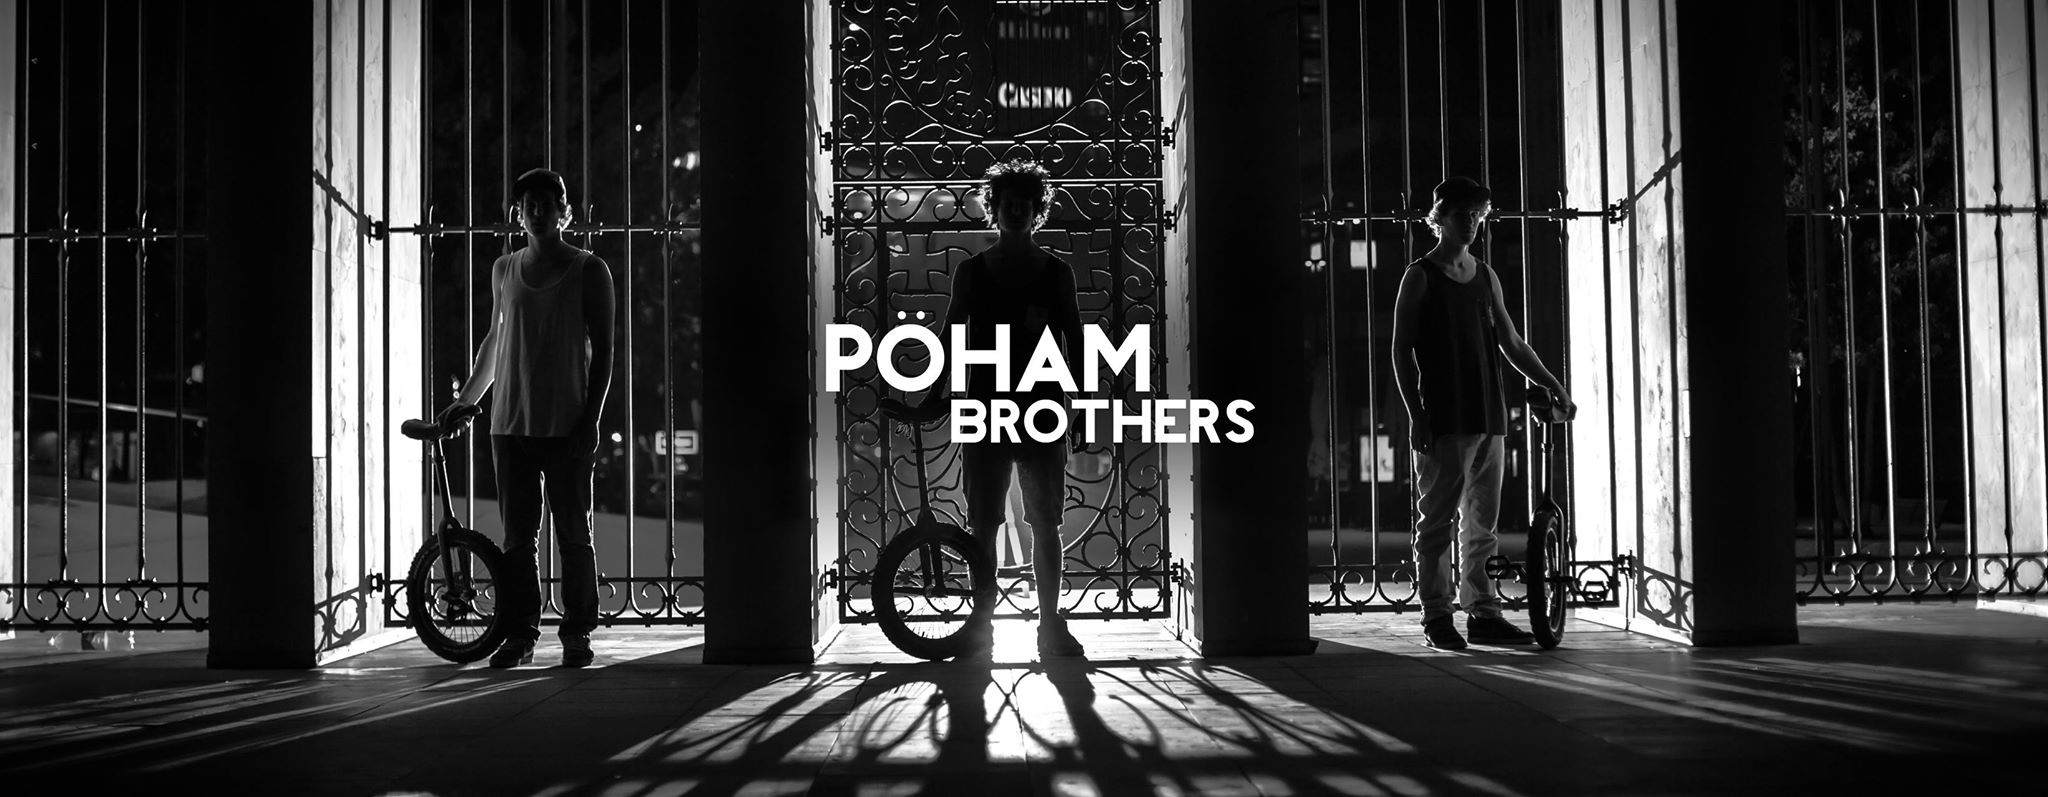 Pöham Brothers